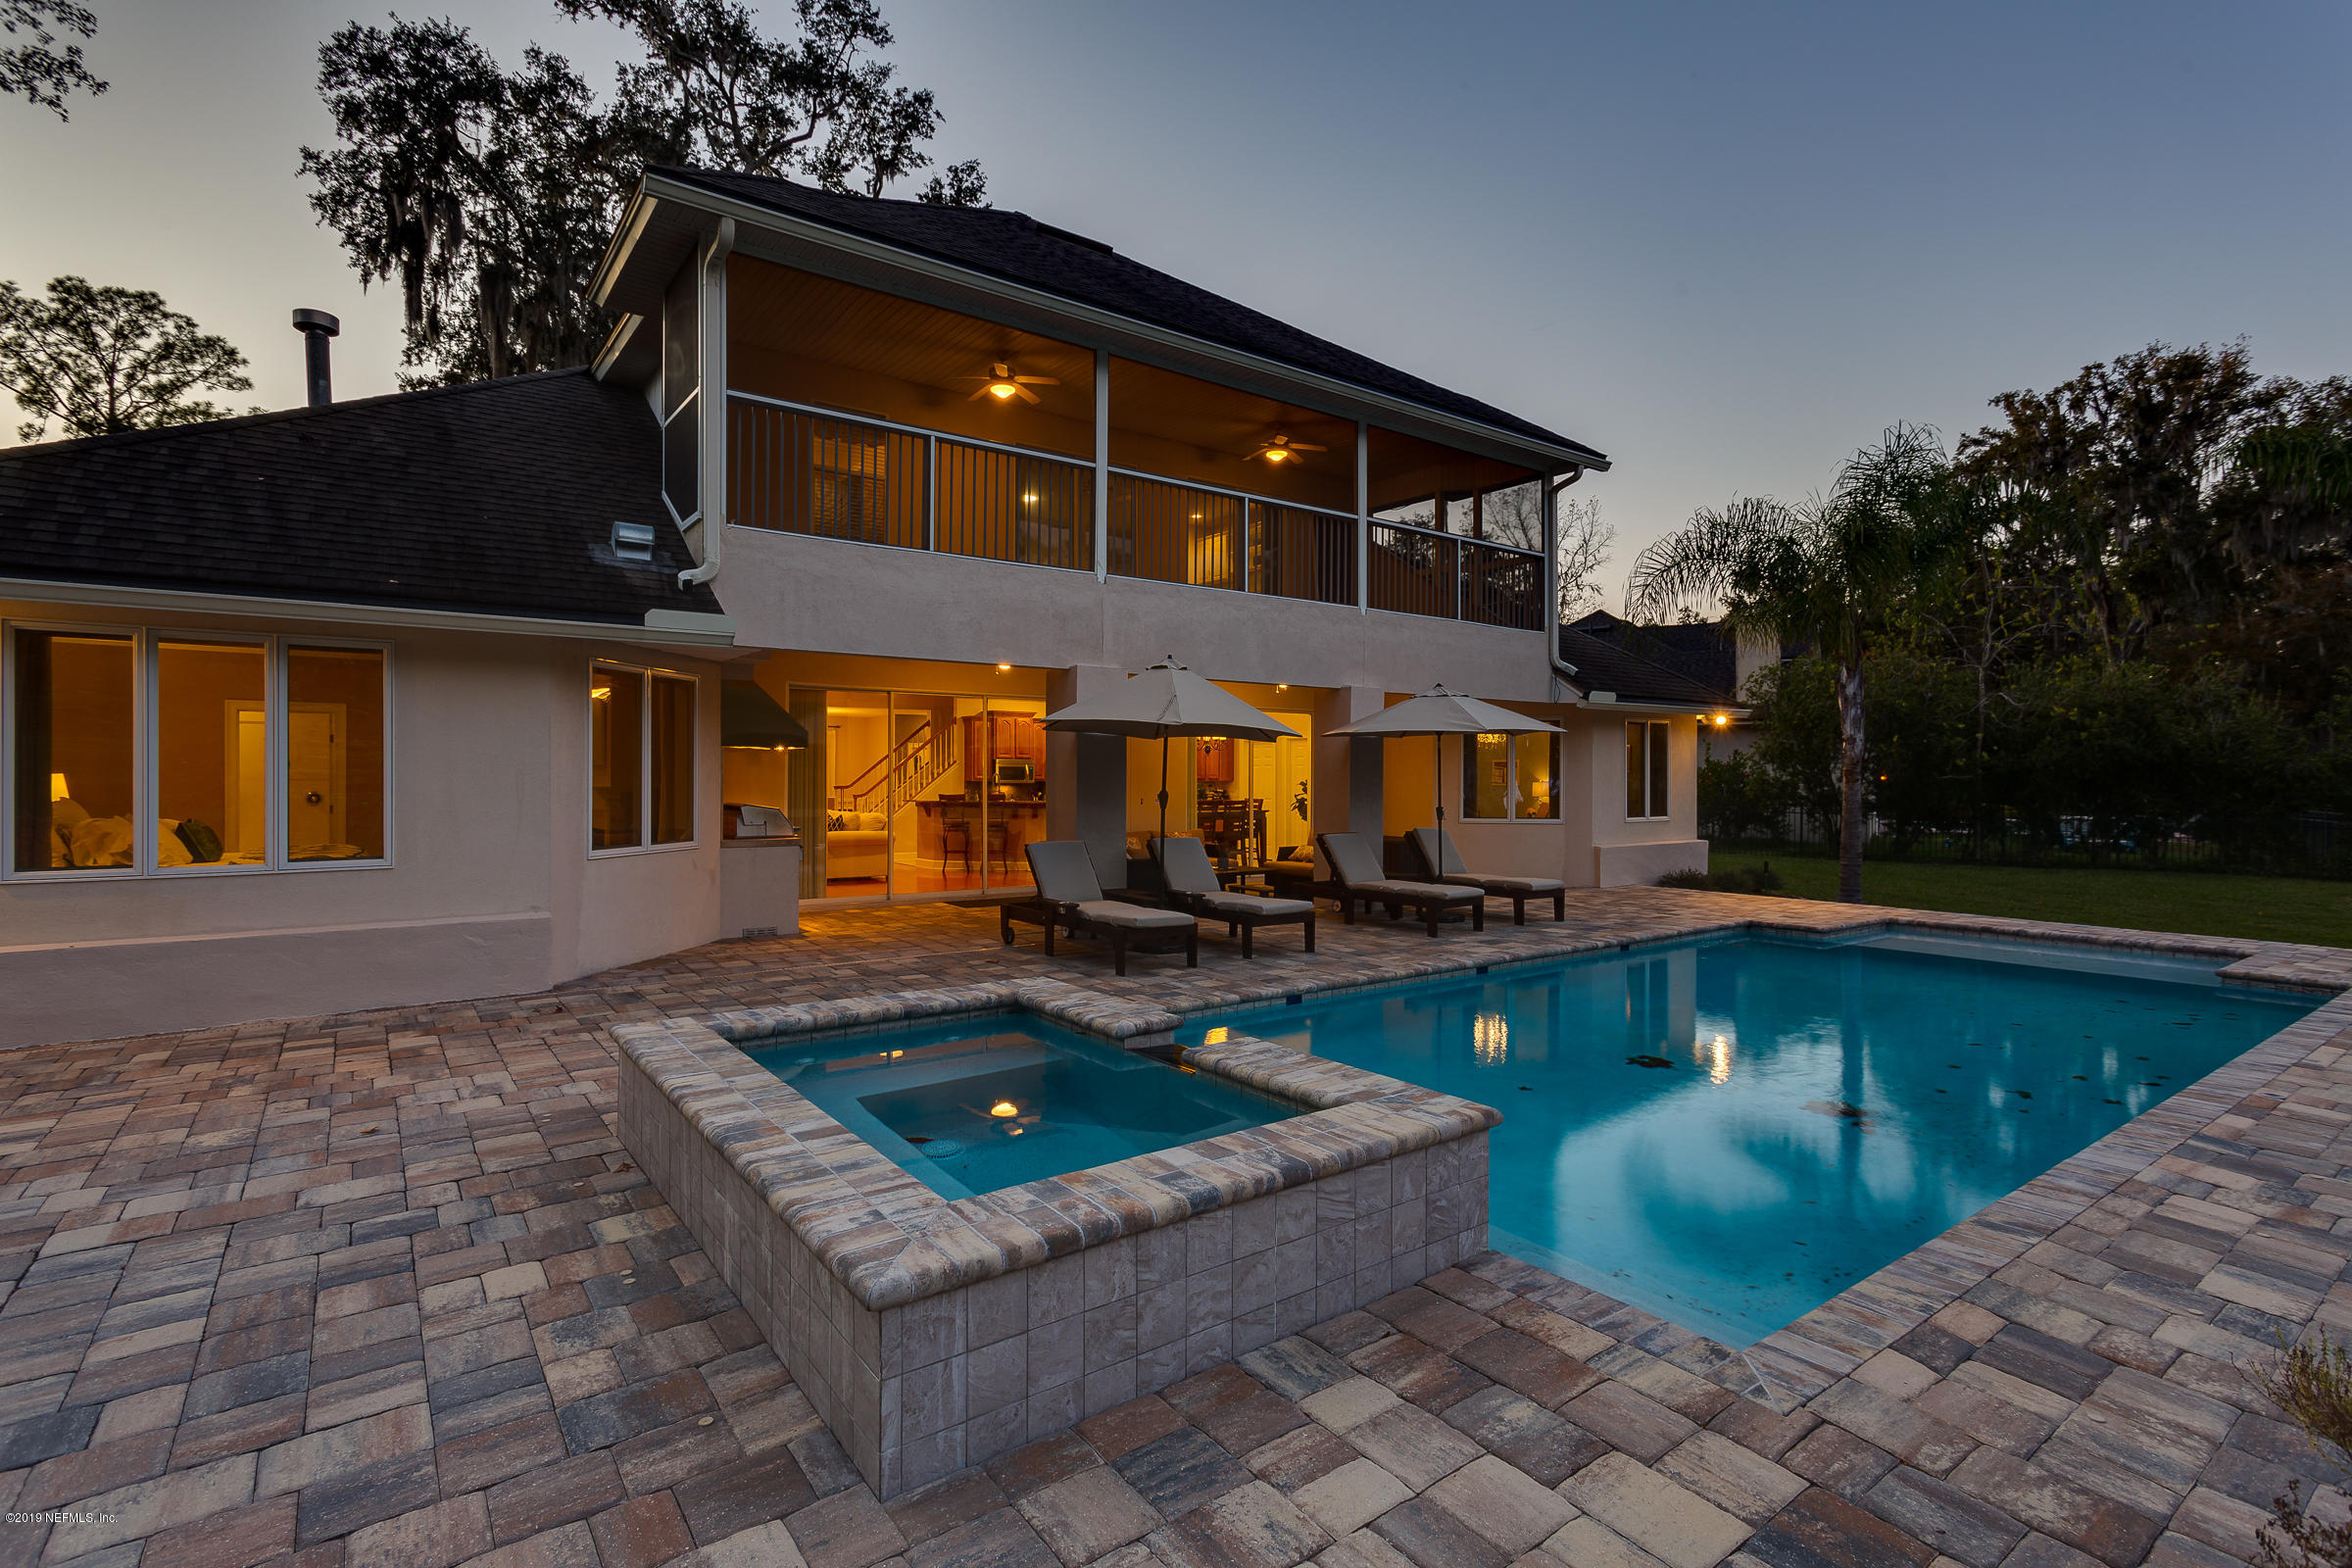 2841 GRANDE OAKS, FLEMING ISLAND, FLORIDA 32003, 5 Bedrooms Bedrooms, ,3 BathroomsBathrooms,Residential,For sale,GRANDE OAKS,1032979